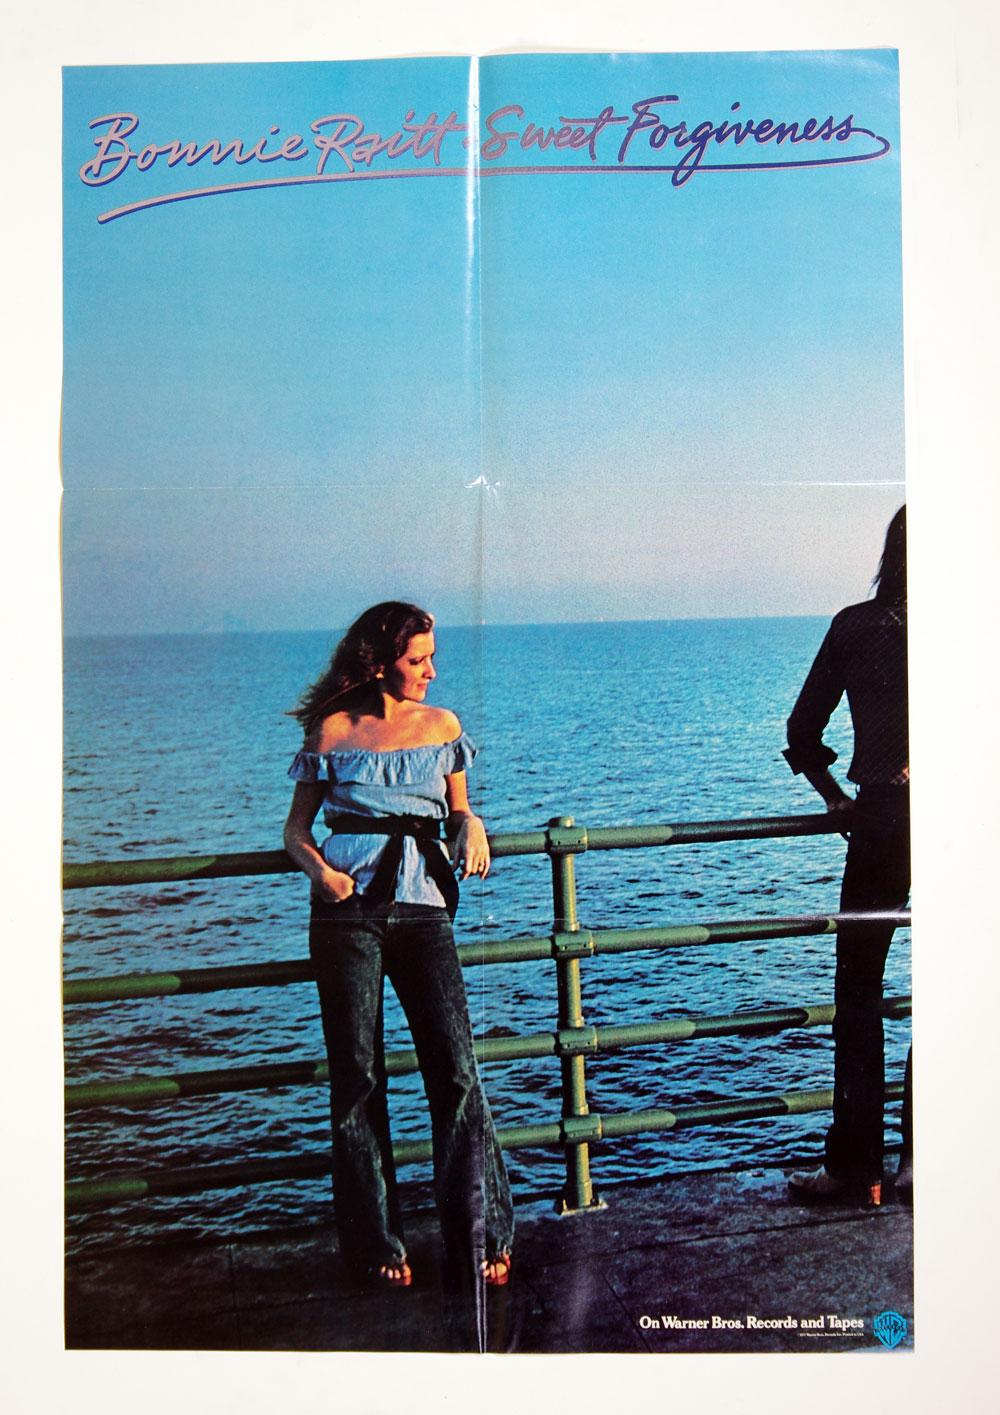 Bonnie Raitt Poster Sweet Foregiveness 1977 New Album Promo 23 x 35